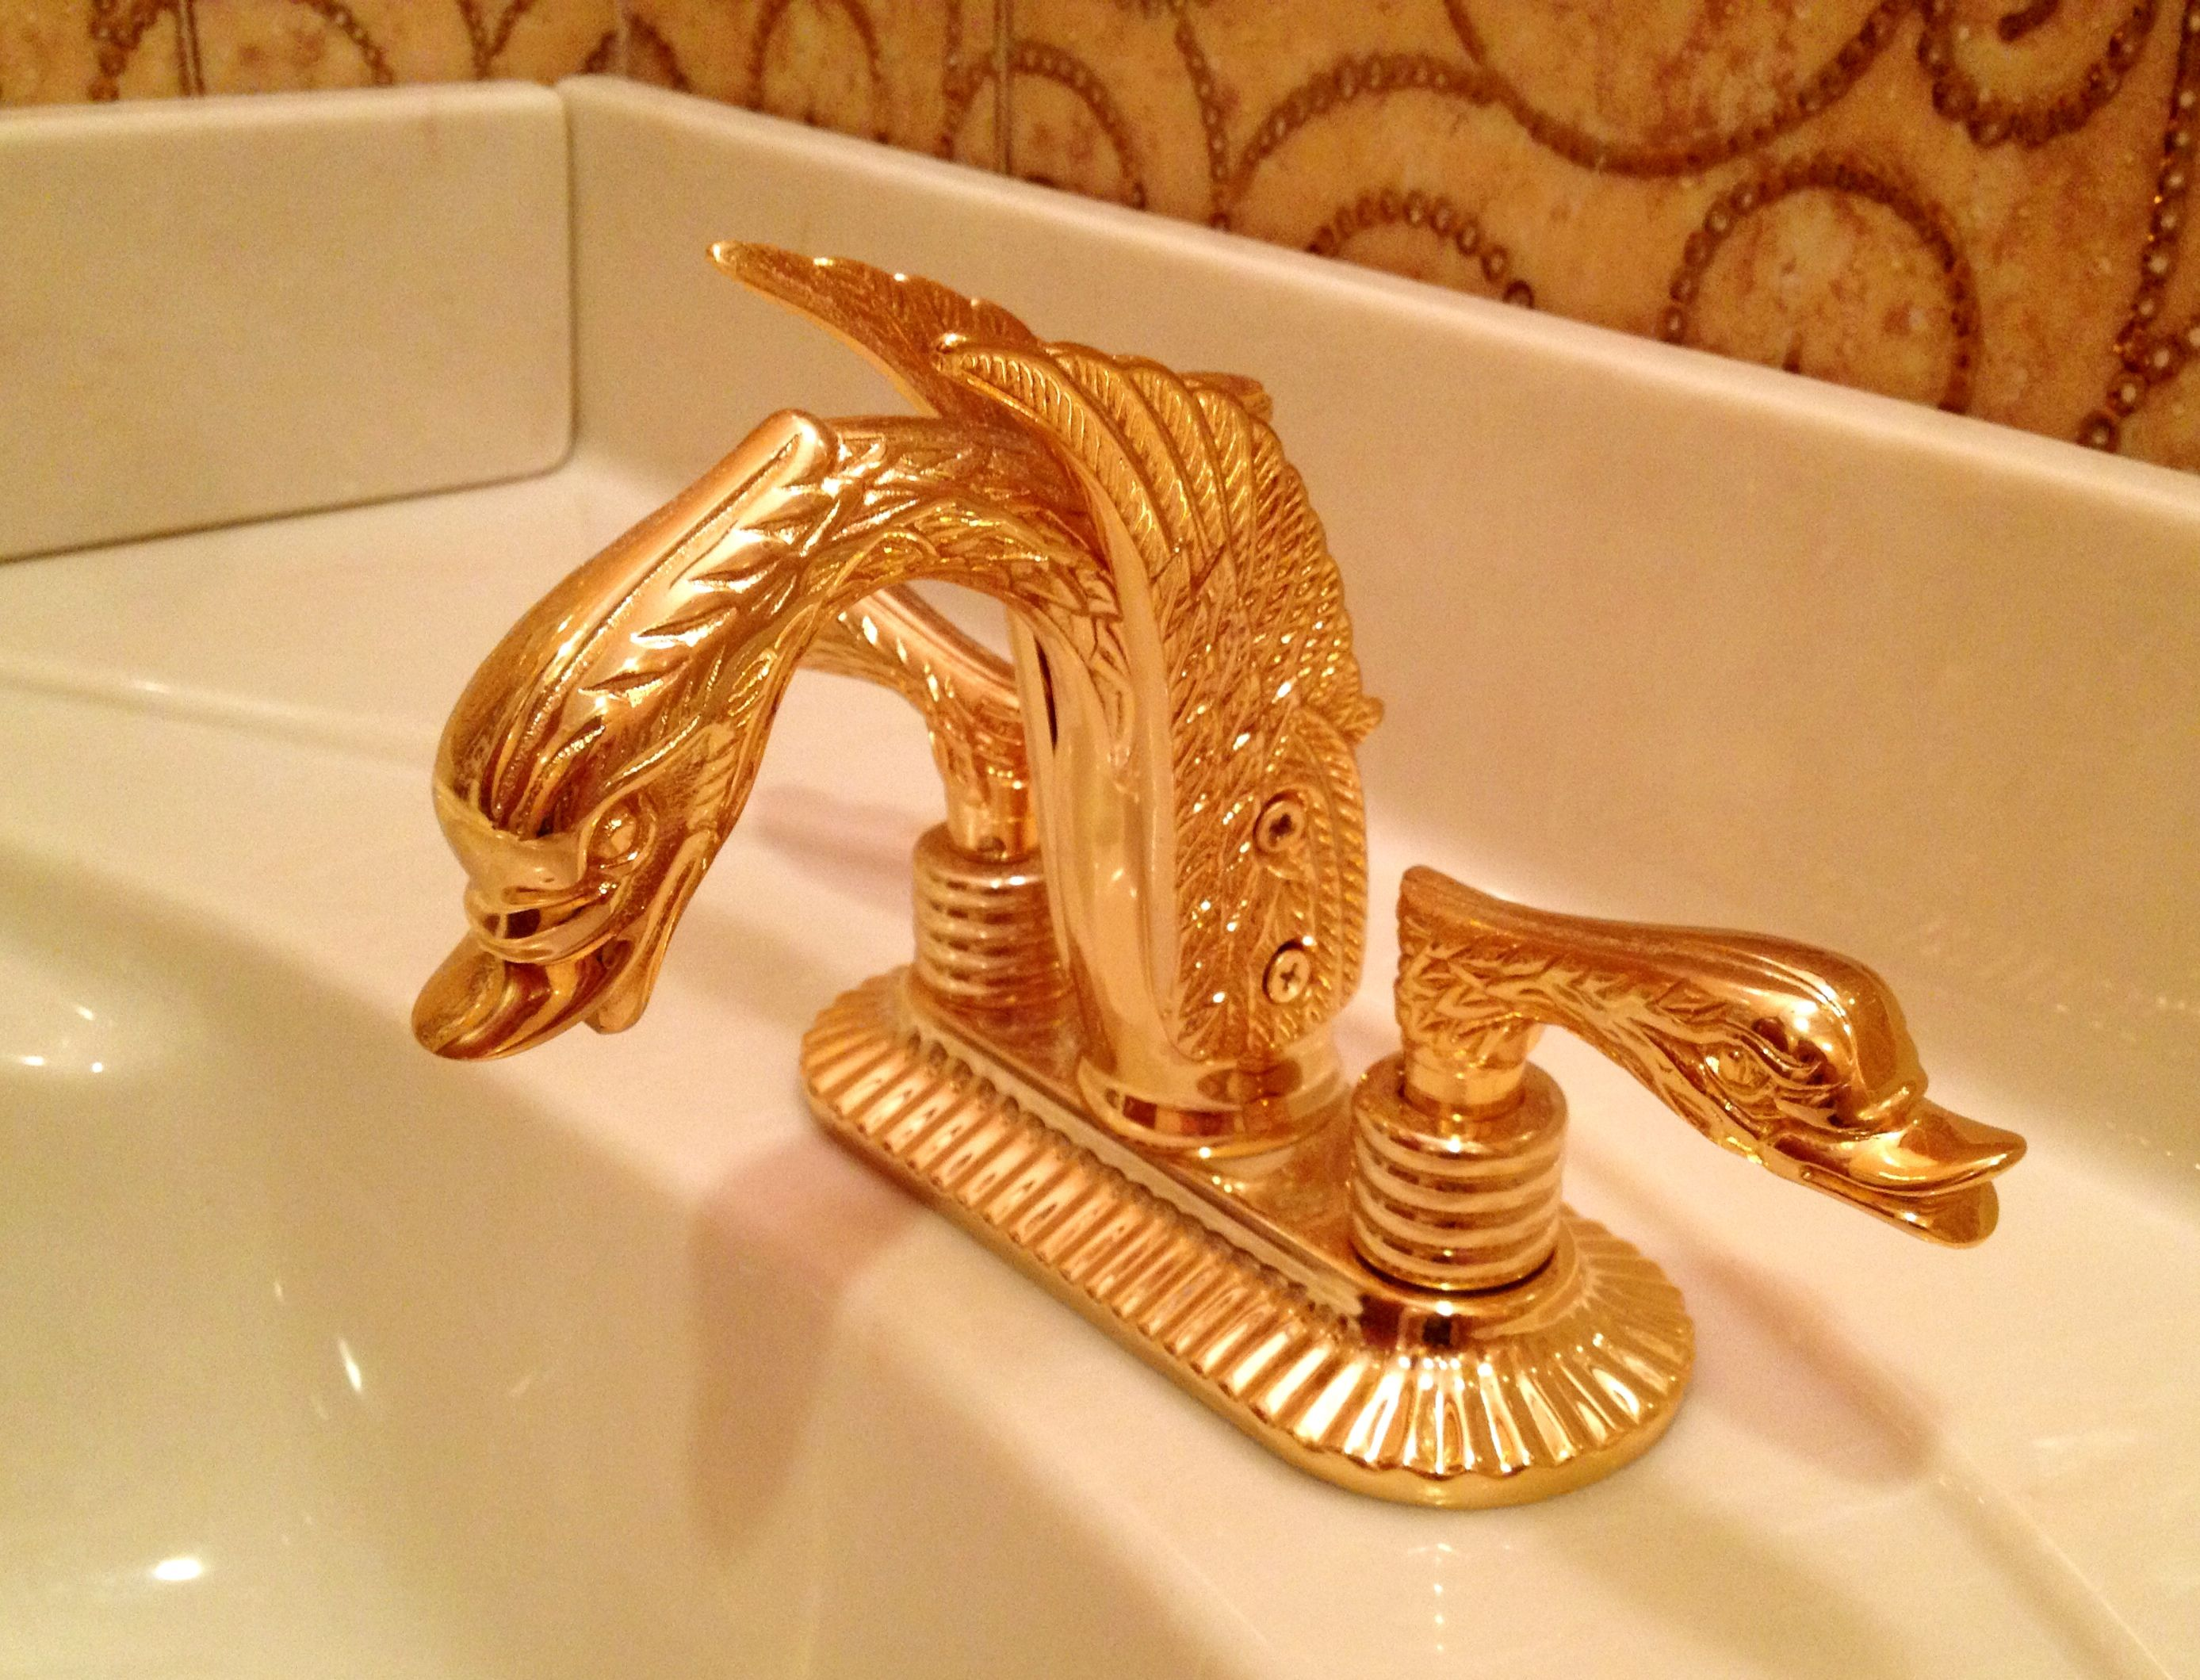 Bathroom sink faucet - Miami Real Estate for Sale - Julia Romantsova ...